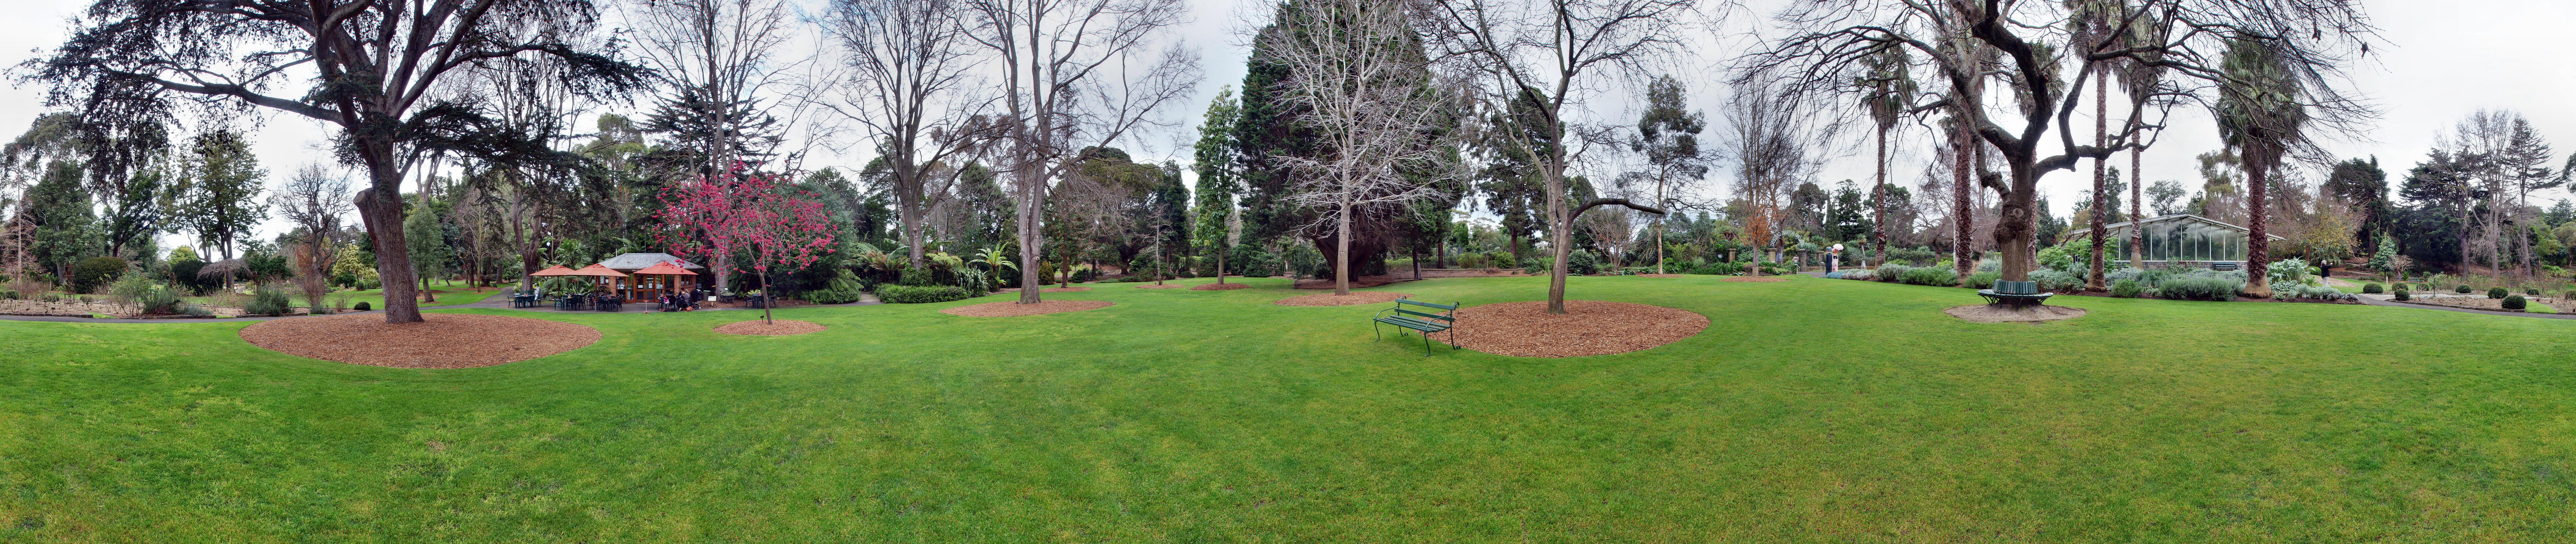 Geelong-Botanic-Gardens-4.jpeg